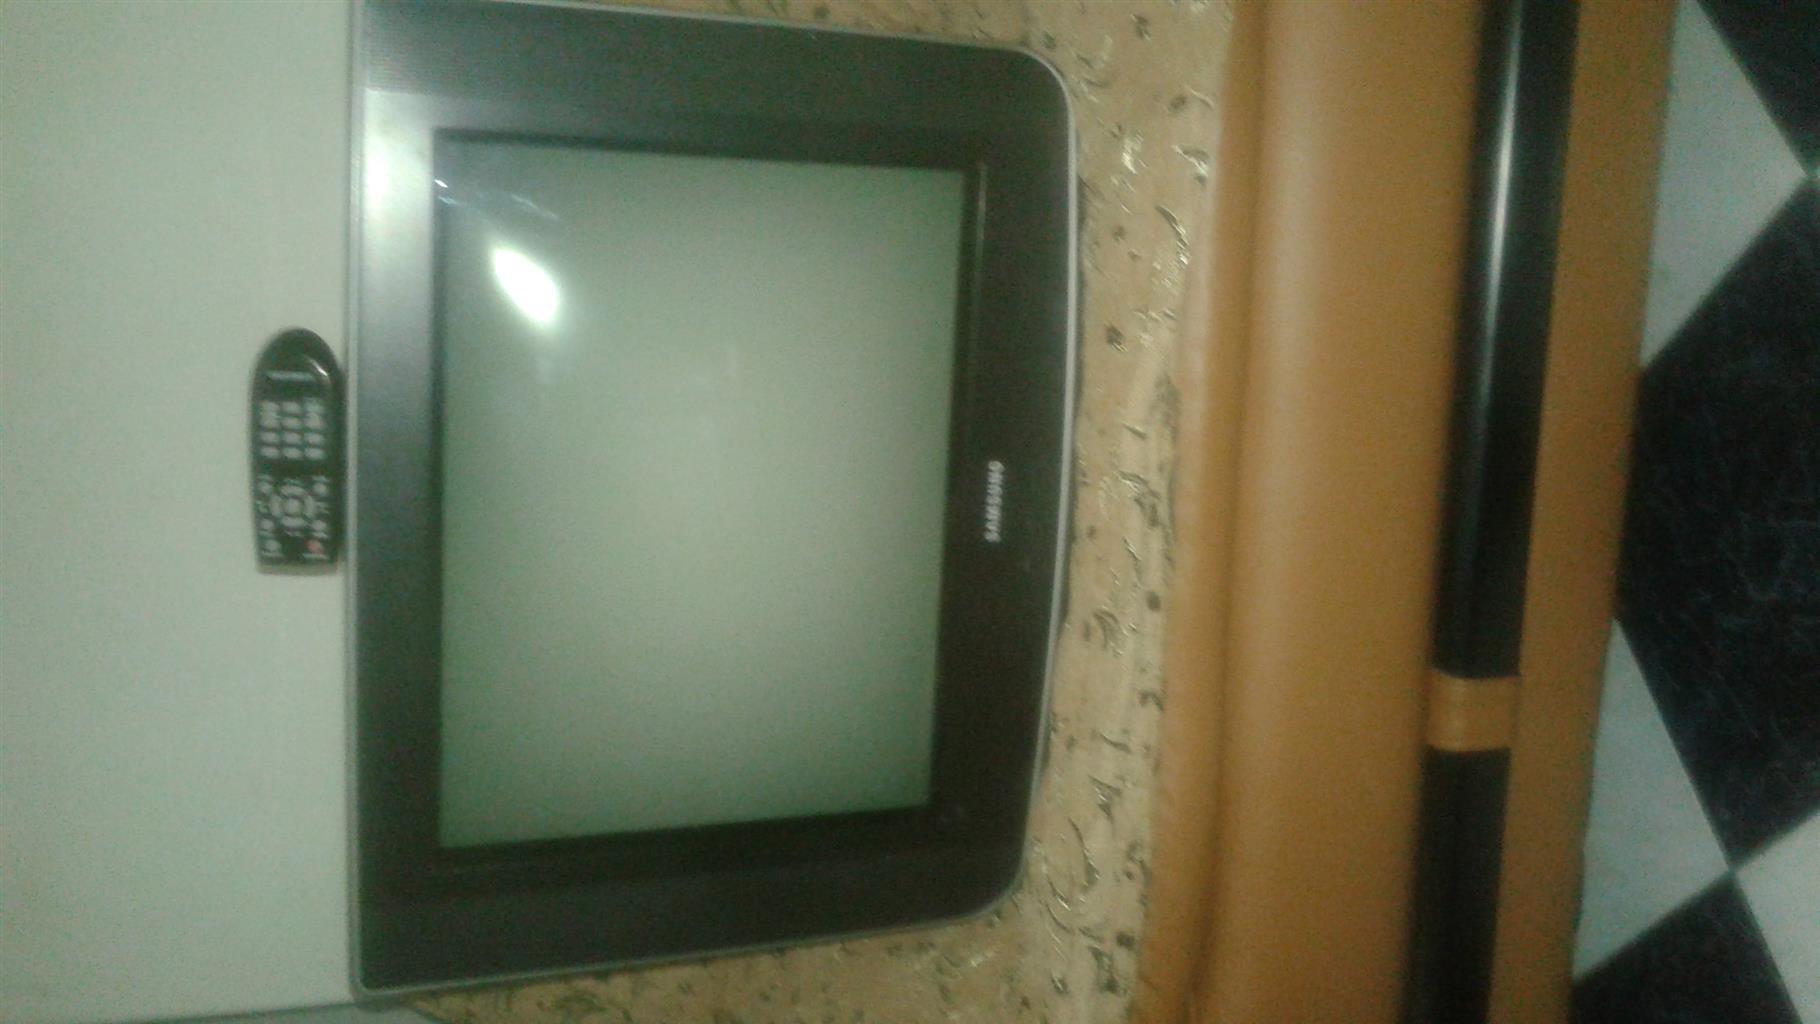 Samsung 54cm Tube Television With Original Remote